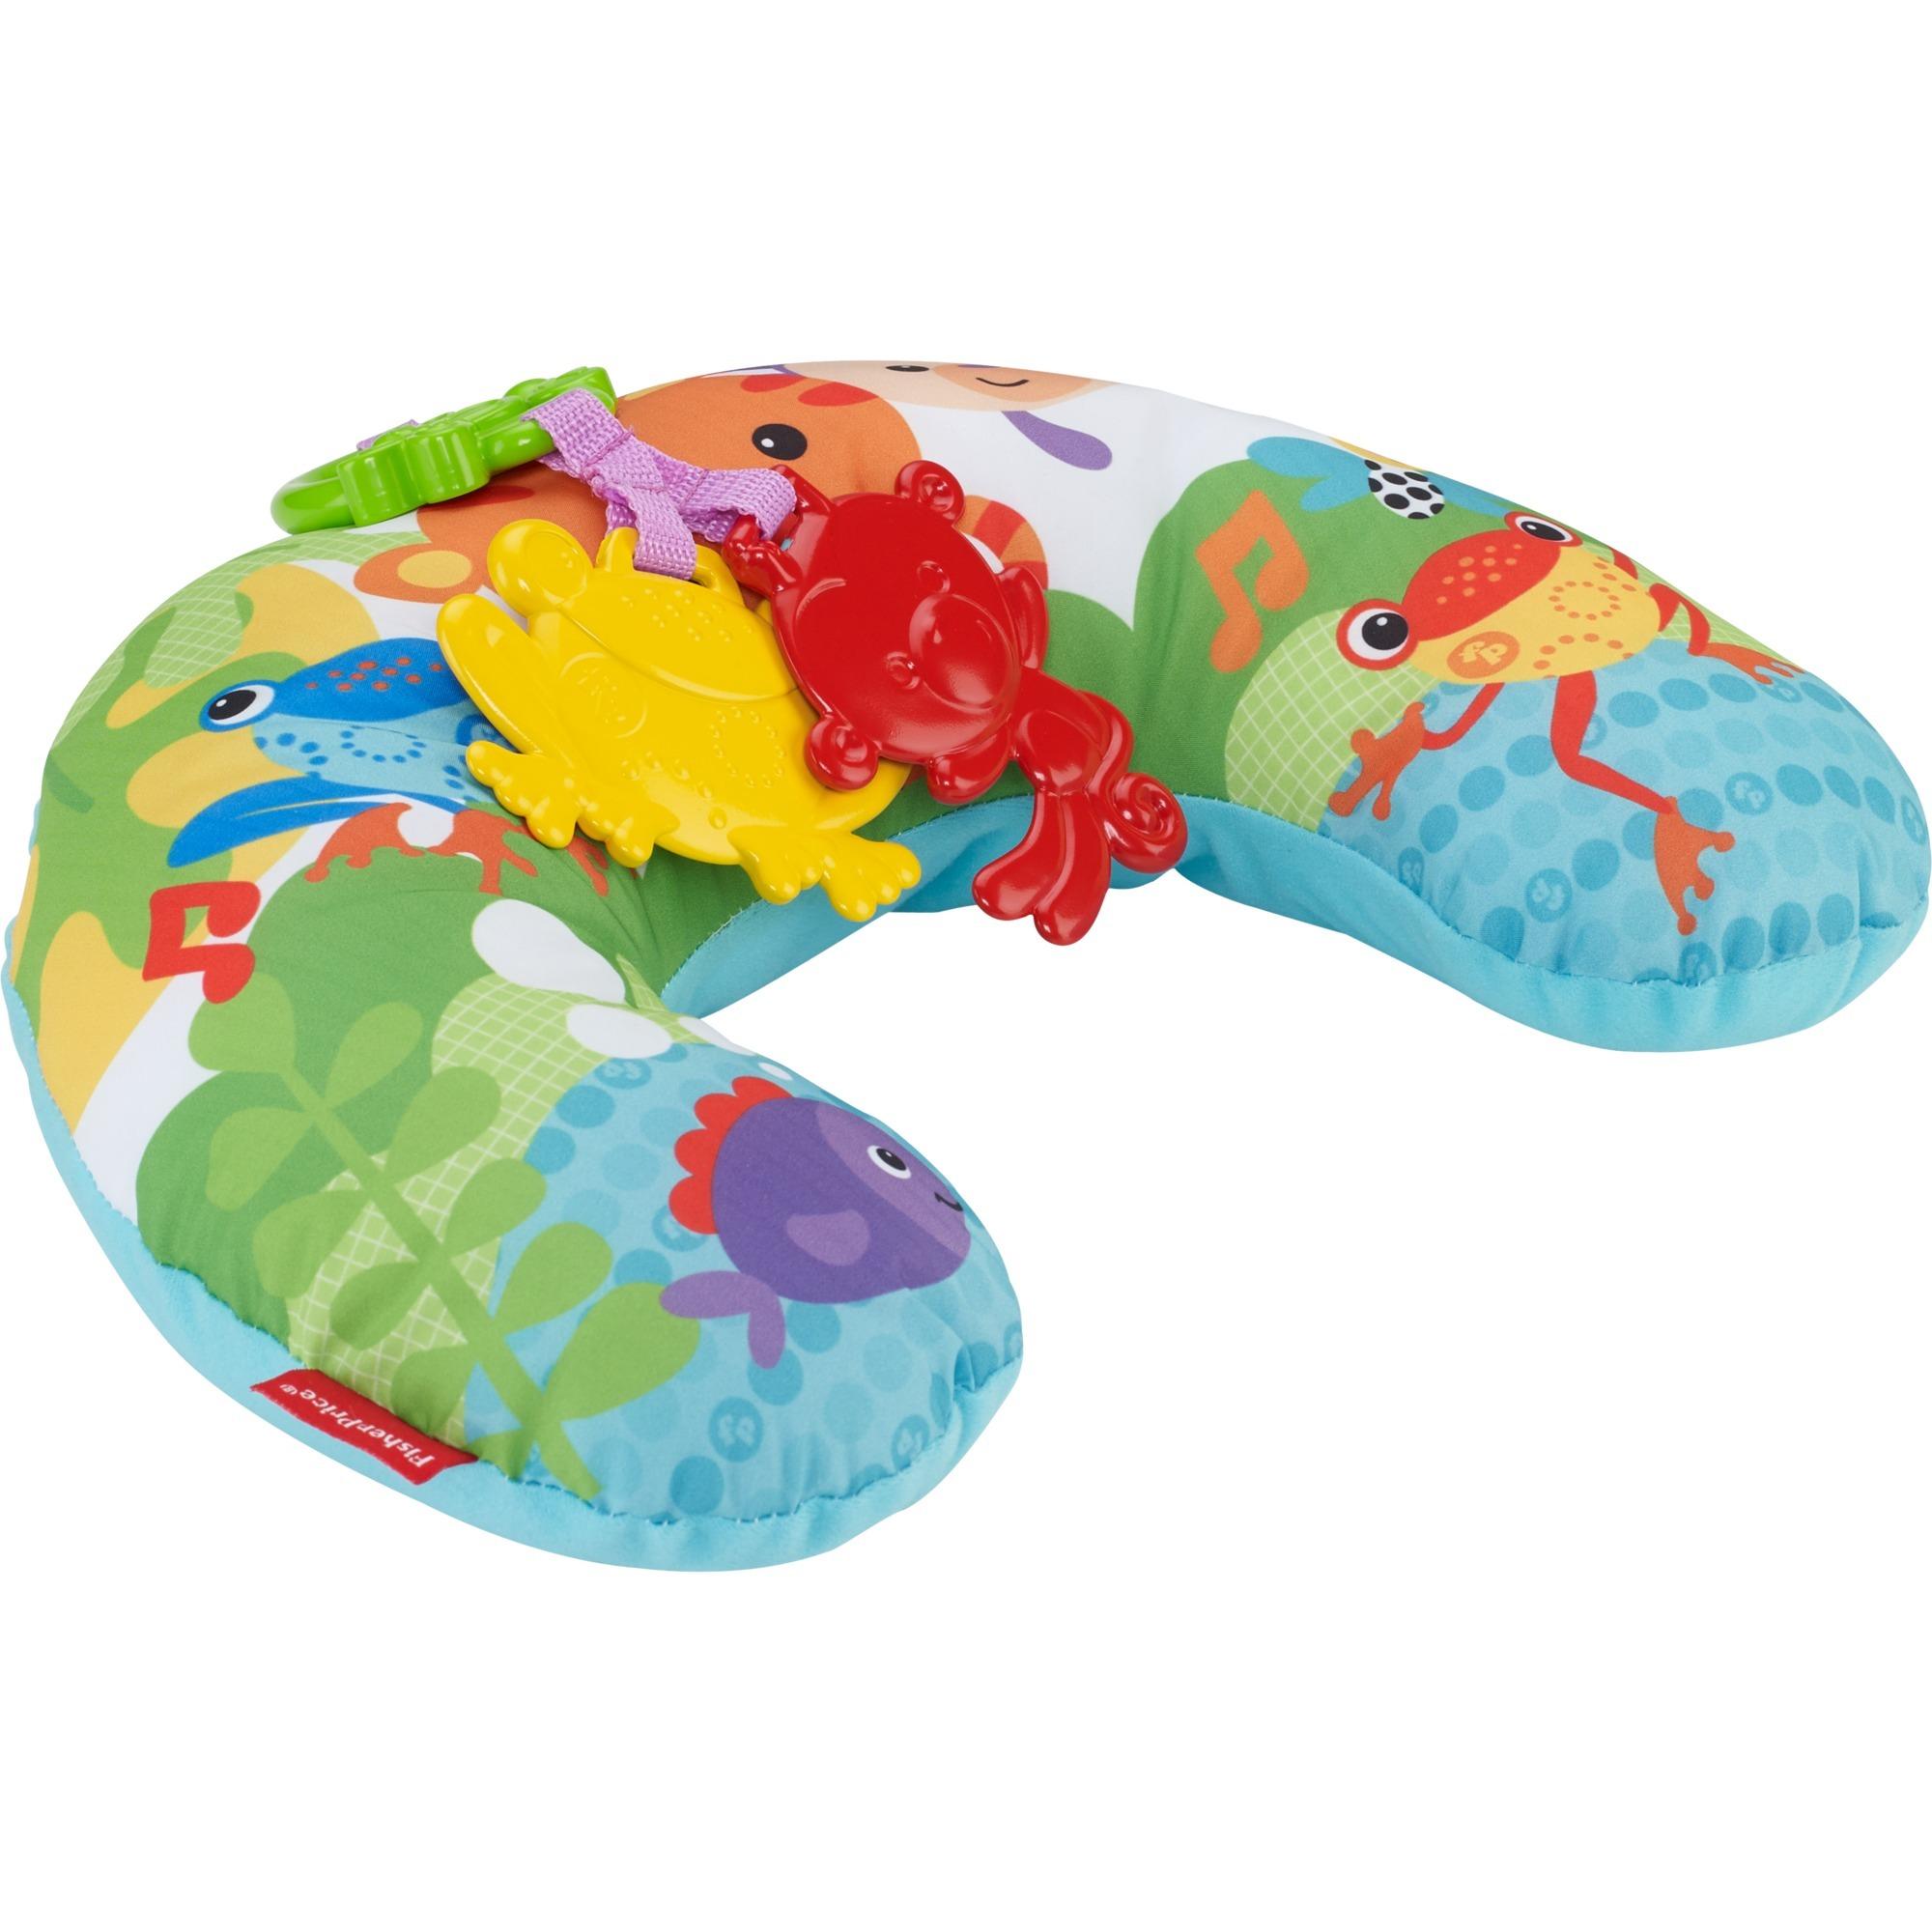 Rainforest play cushion, Gimnasio de actividades/Alfombra